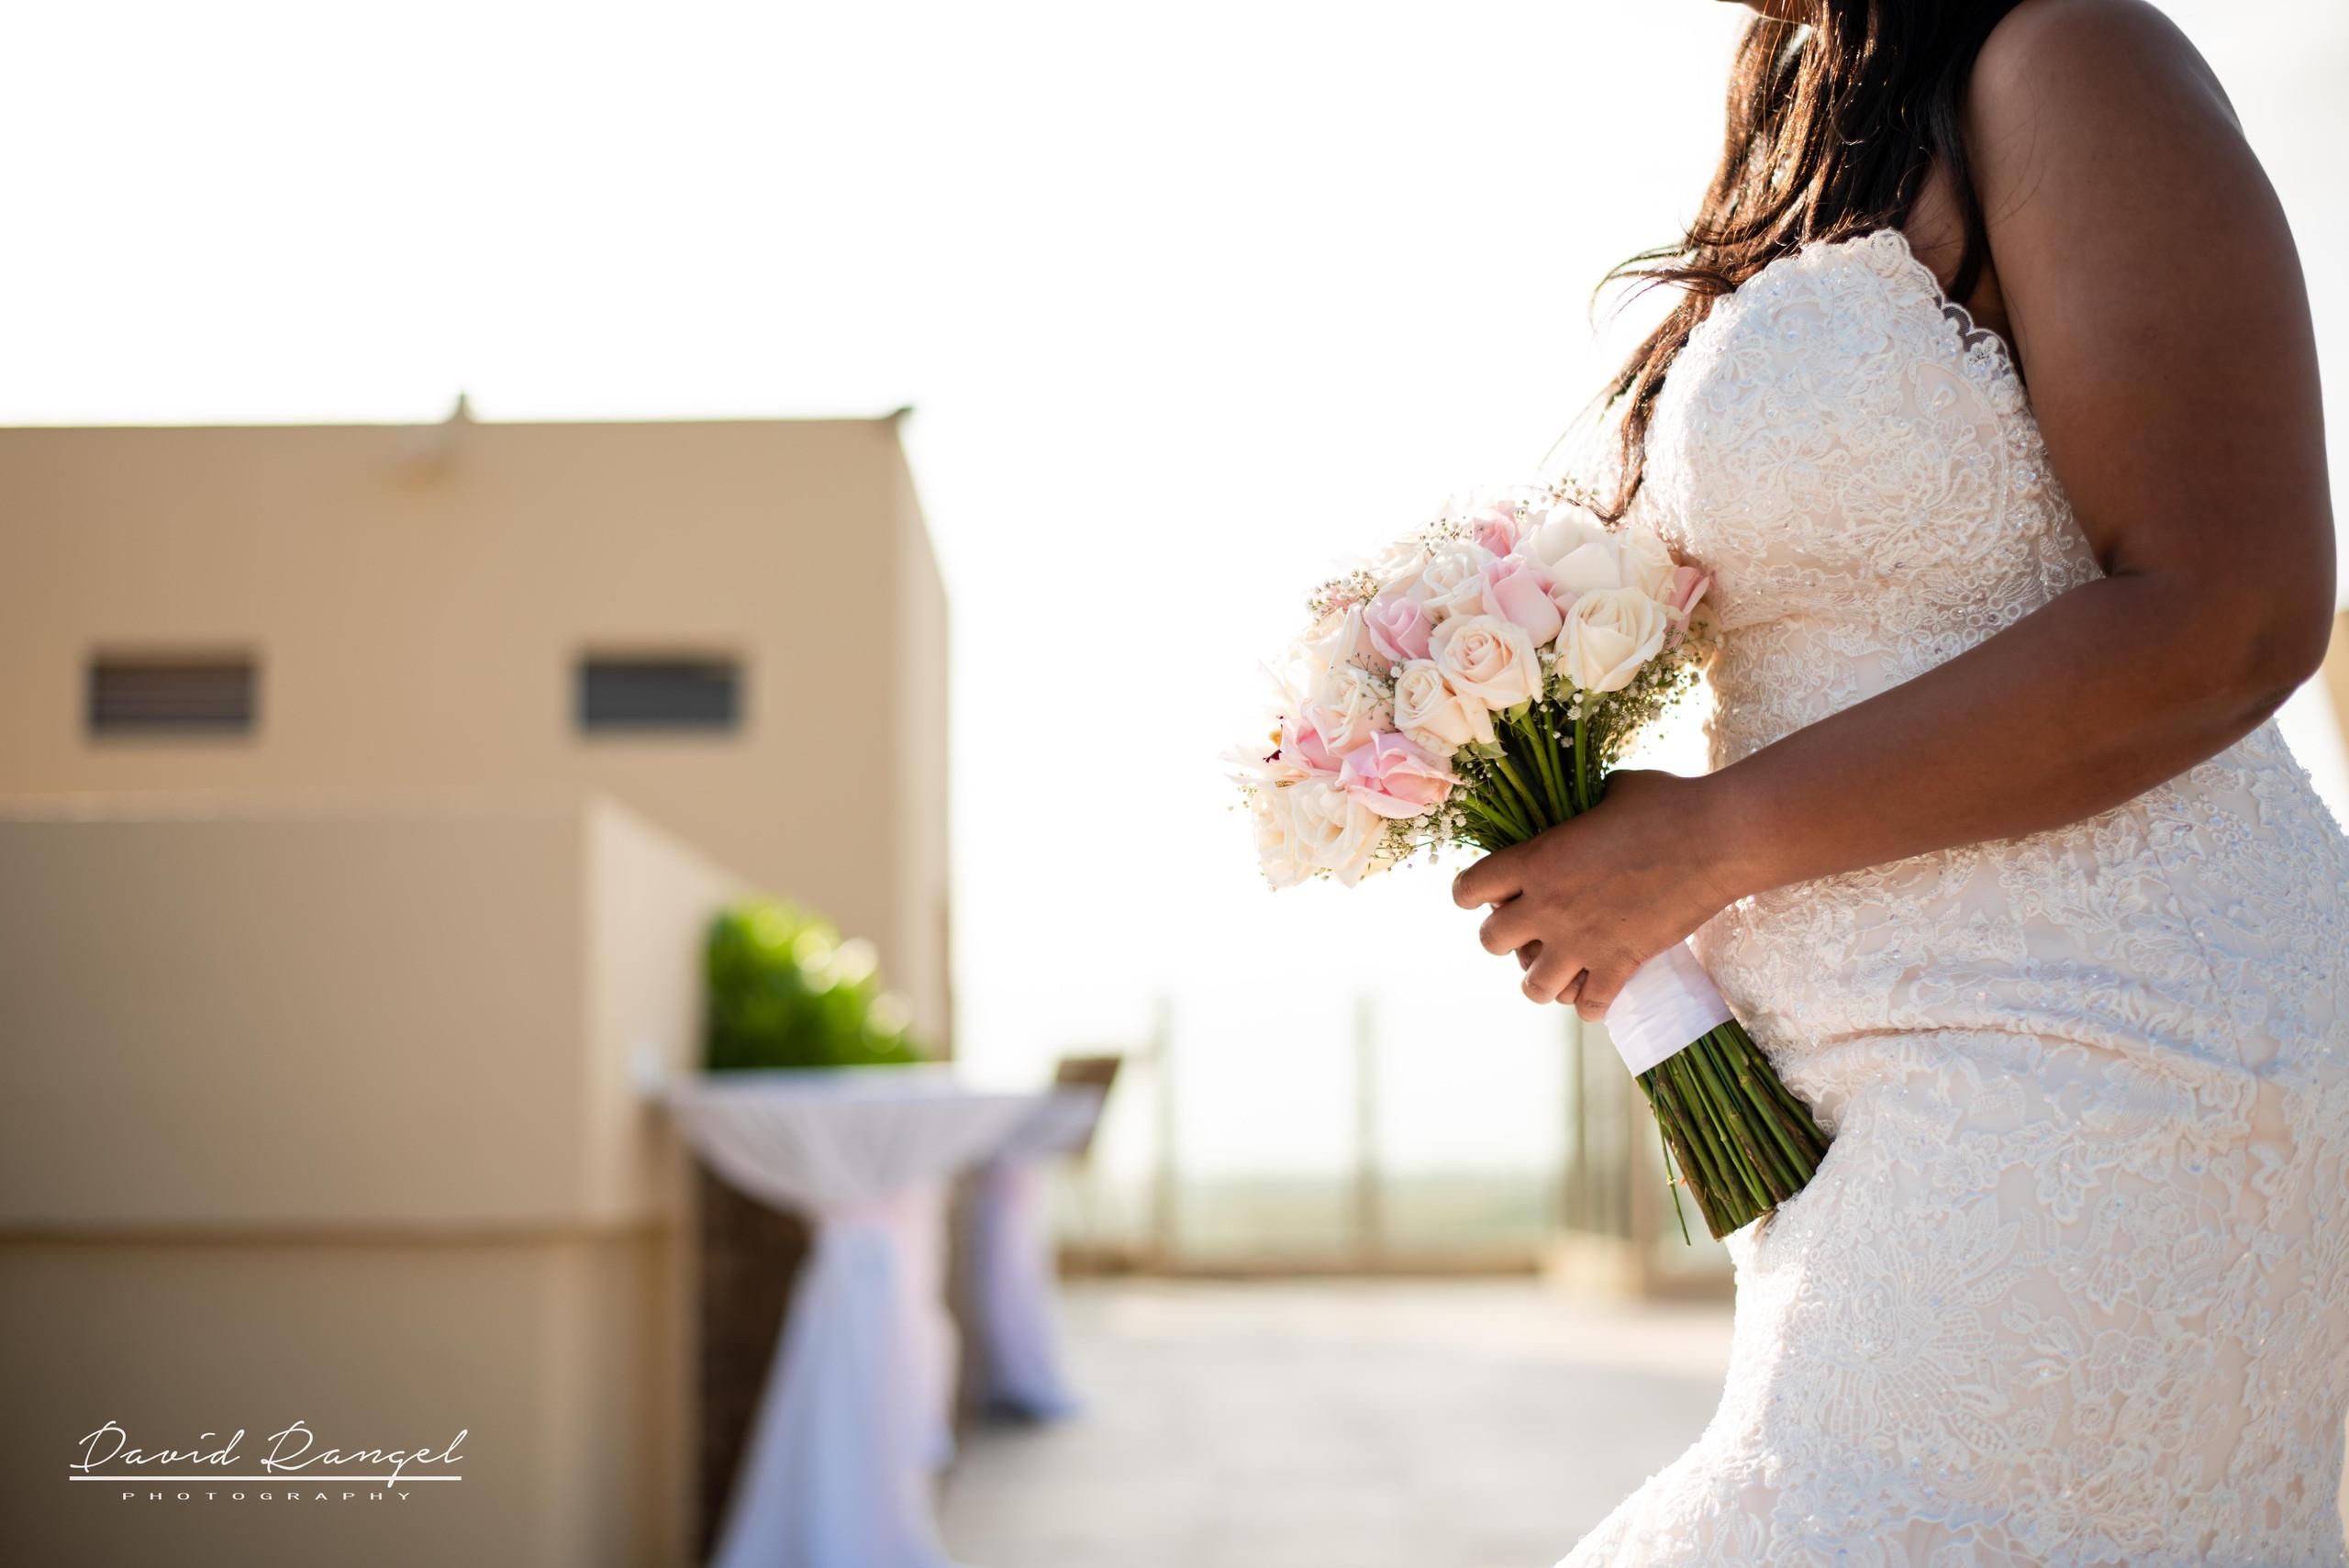 bride+bouquet+walking+to+the+aisle